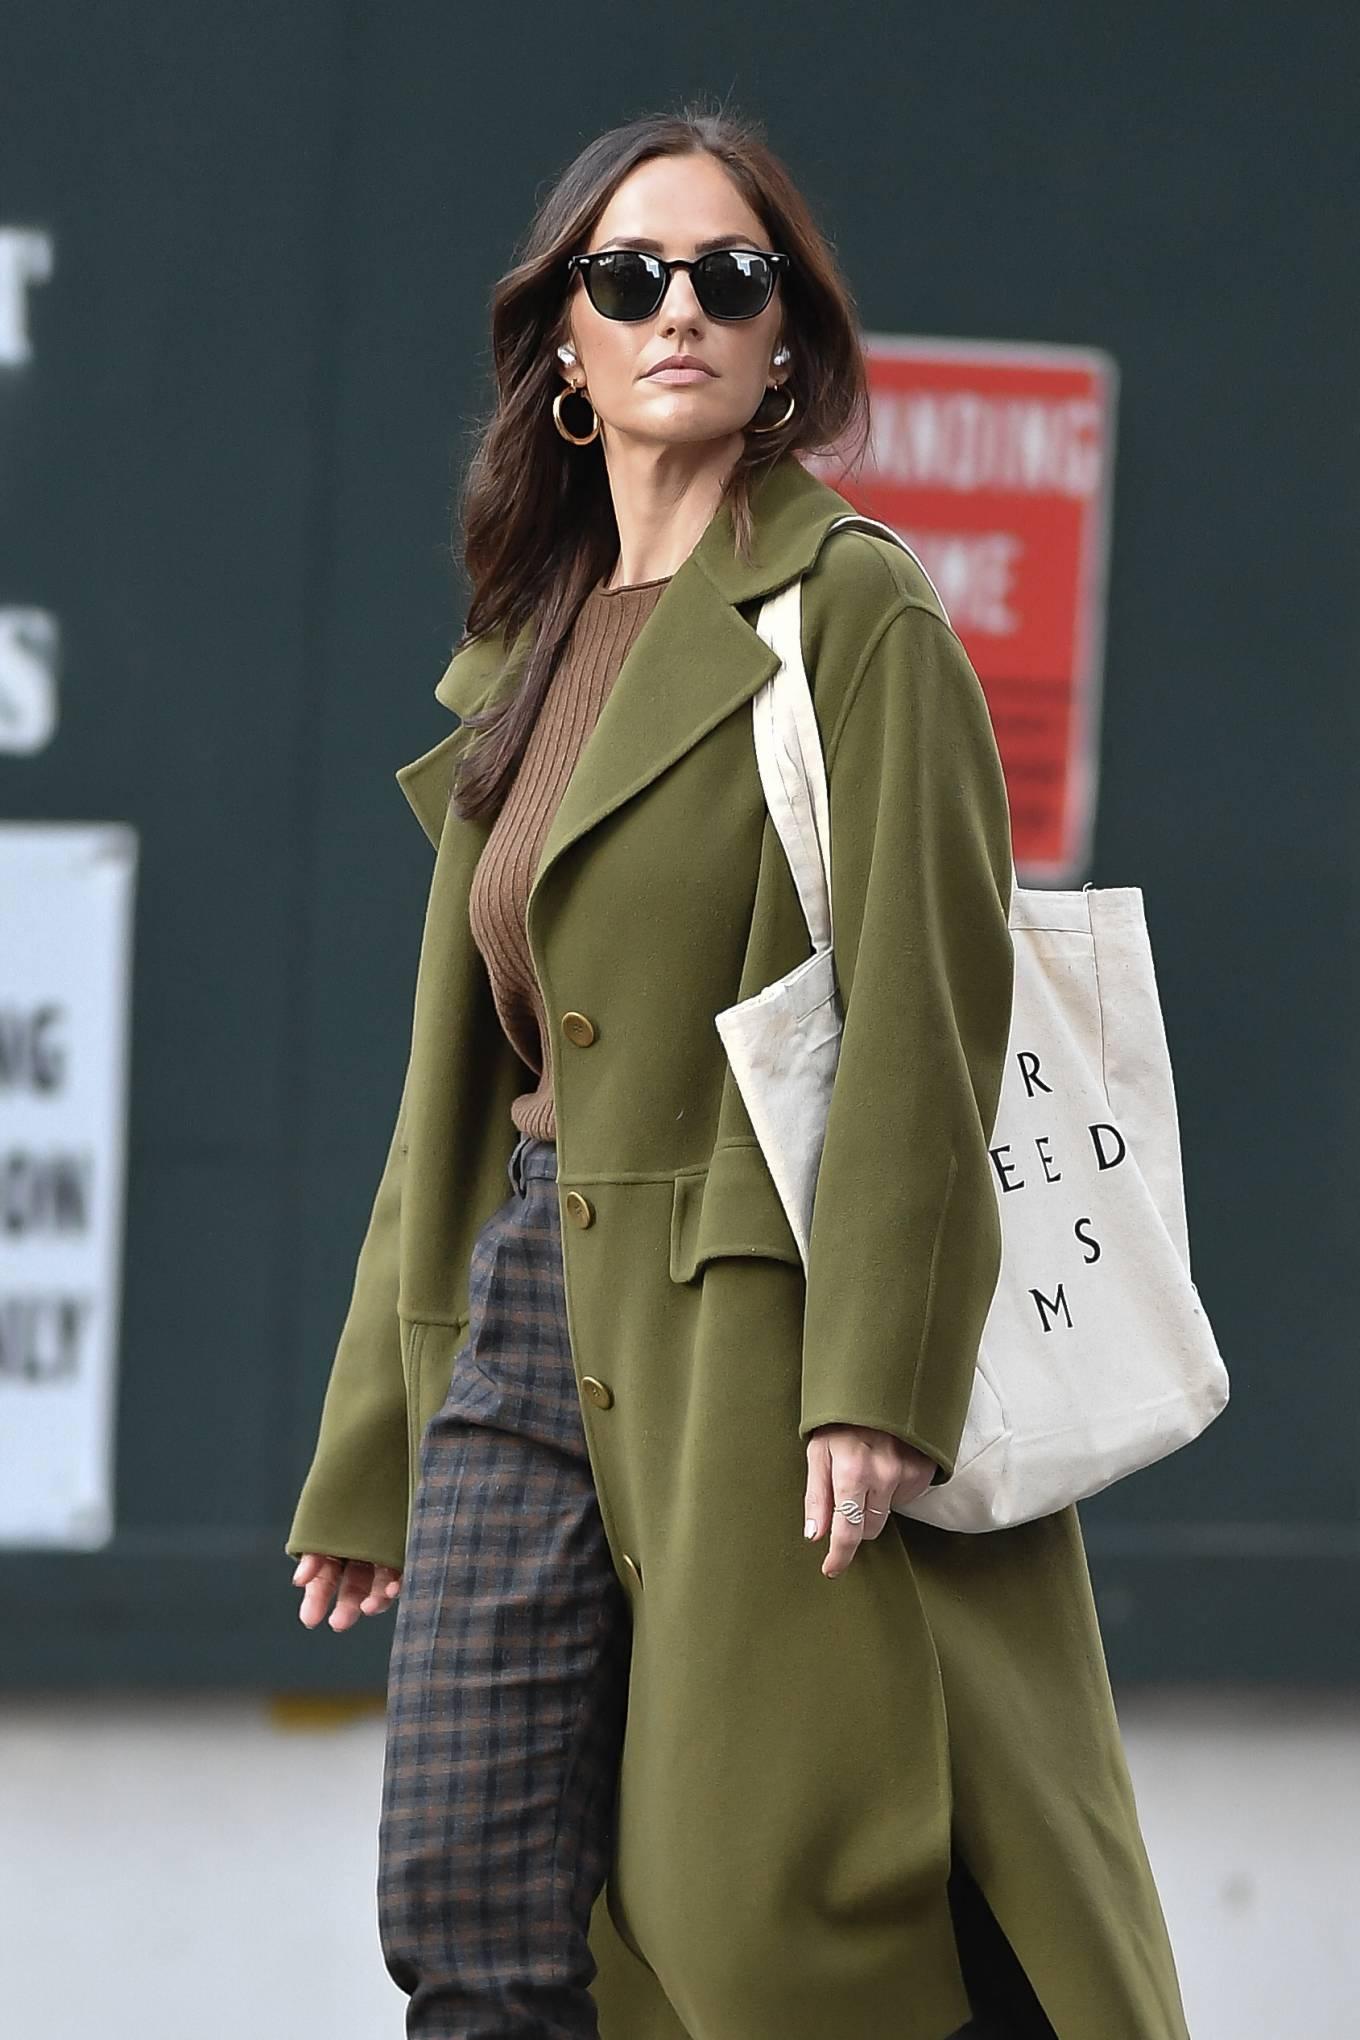 Minka Kelly 2021 : Minka Kelly – In olive green runs errands in New York-33